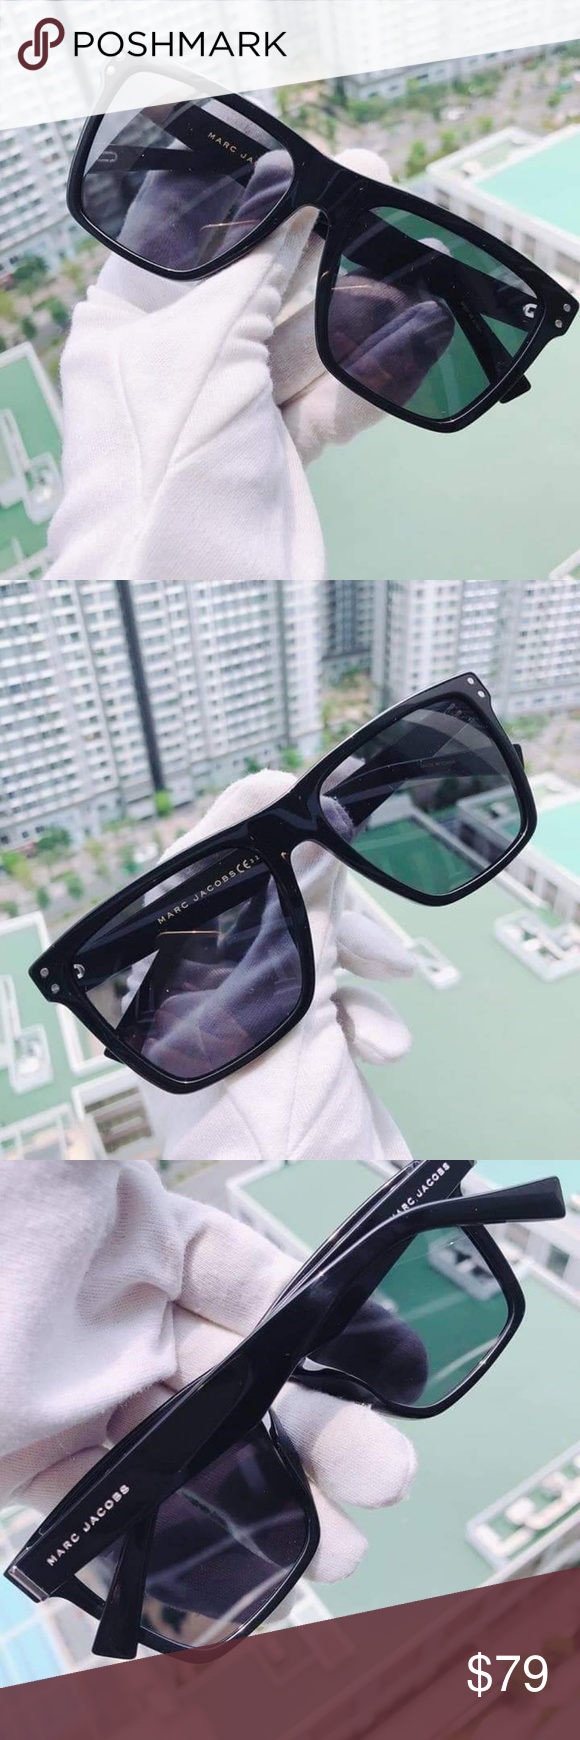 1eb1d850f403 Marc Jacobs women sunglasses Marc Jacobs Sunglasses. Series number:  MARC119S. Color code: